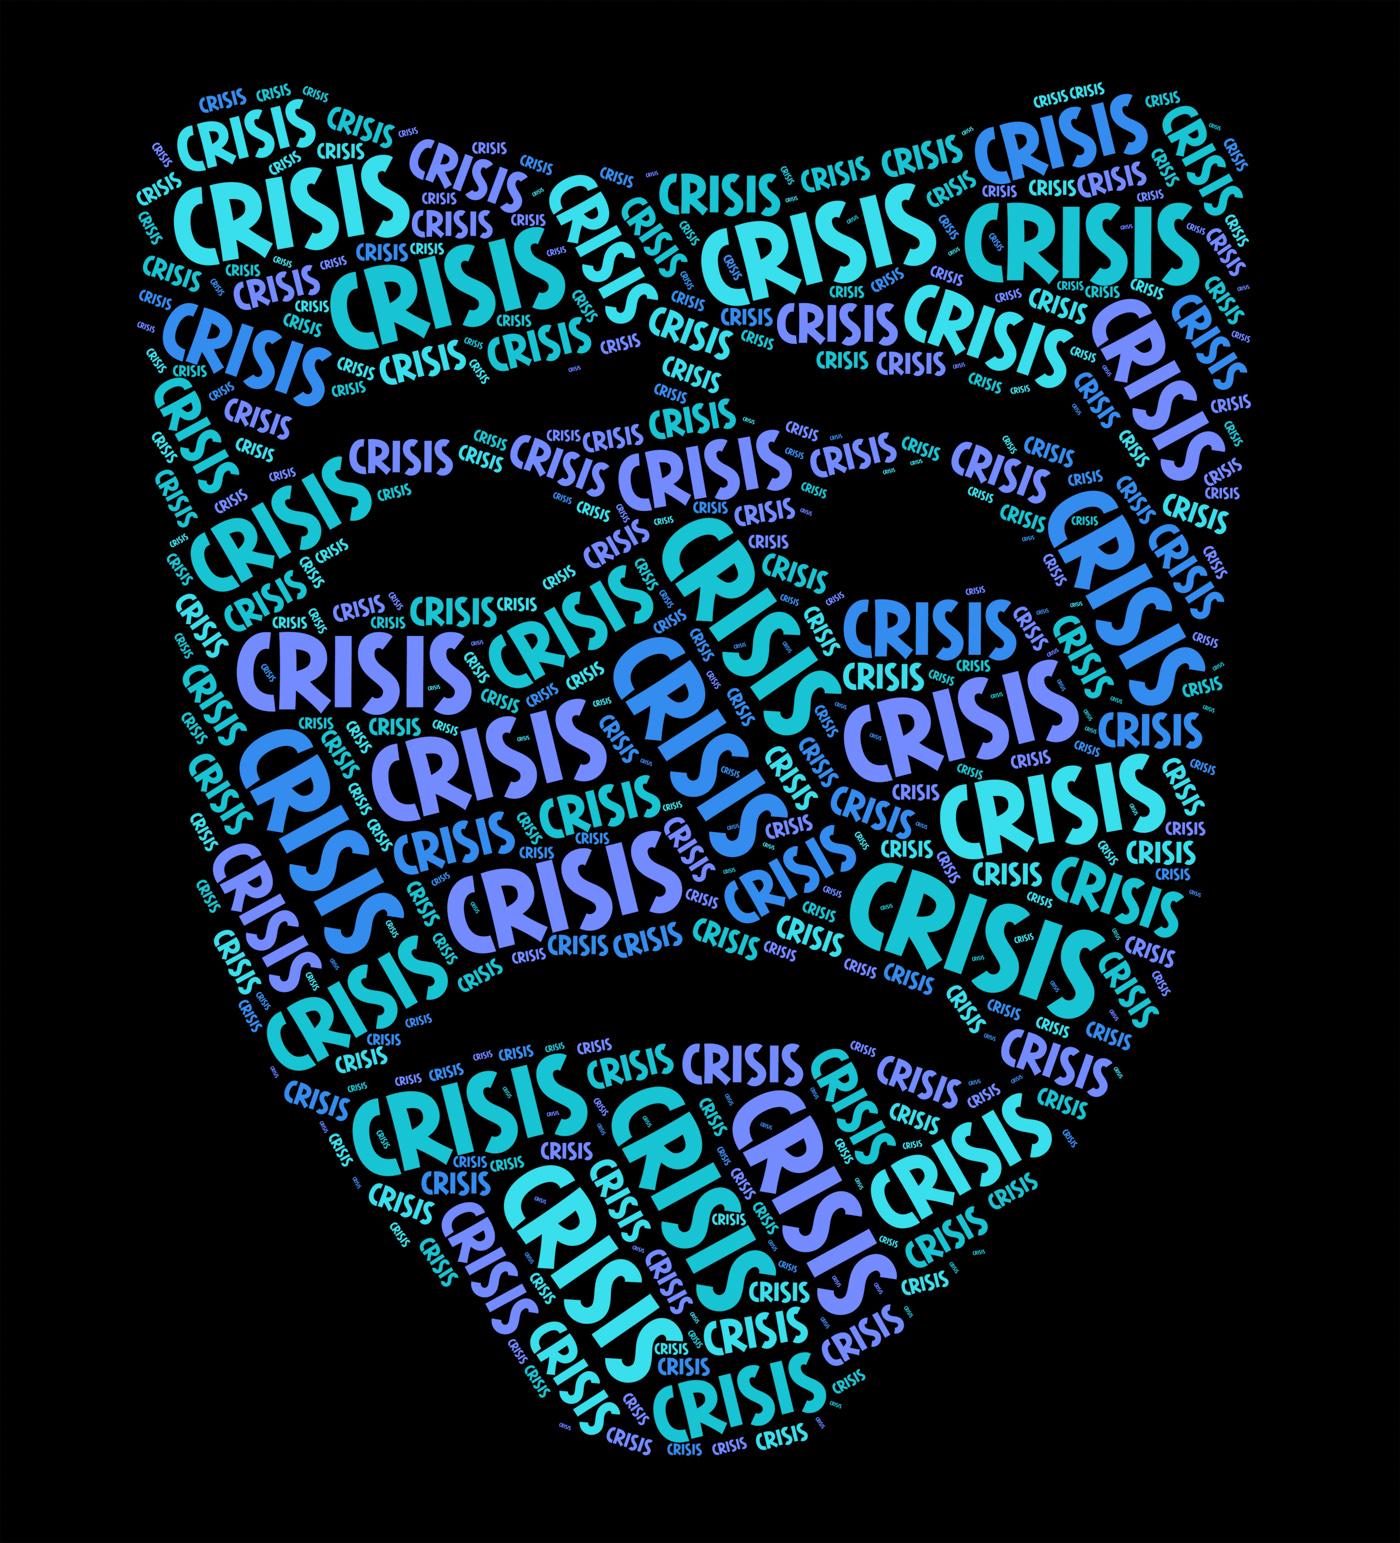 Crisis word indicates dire straits and calamity photo